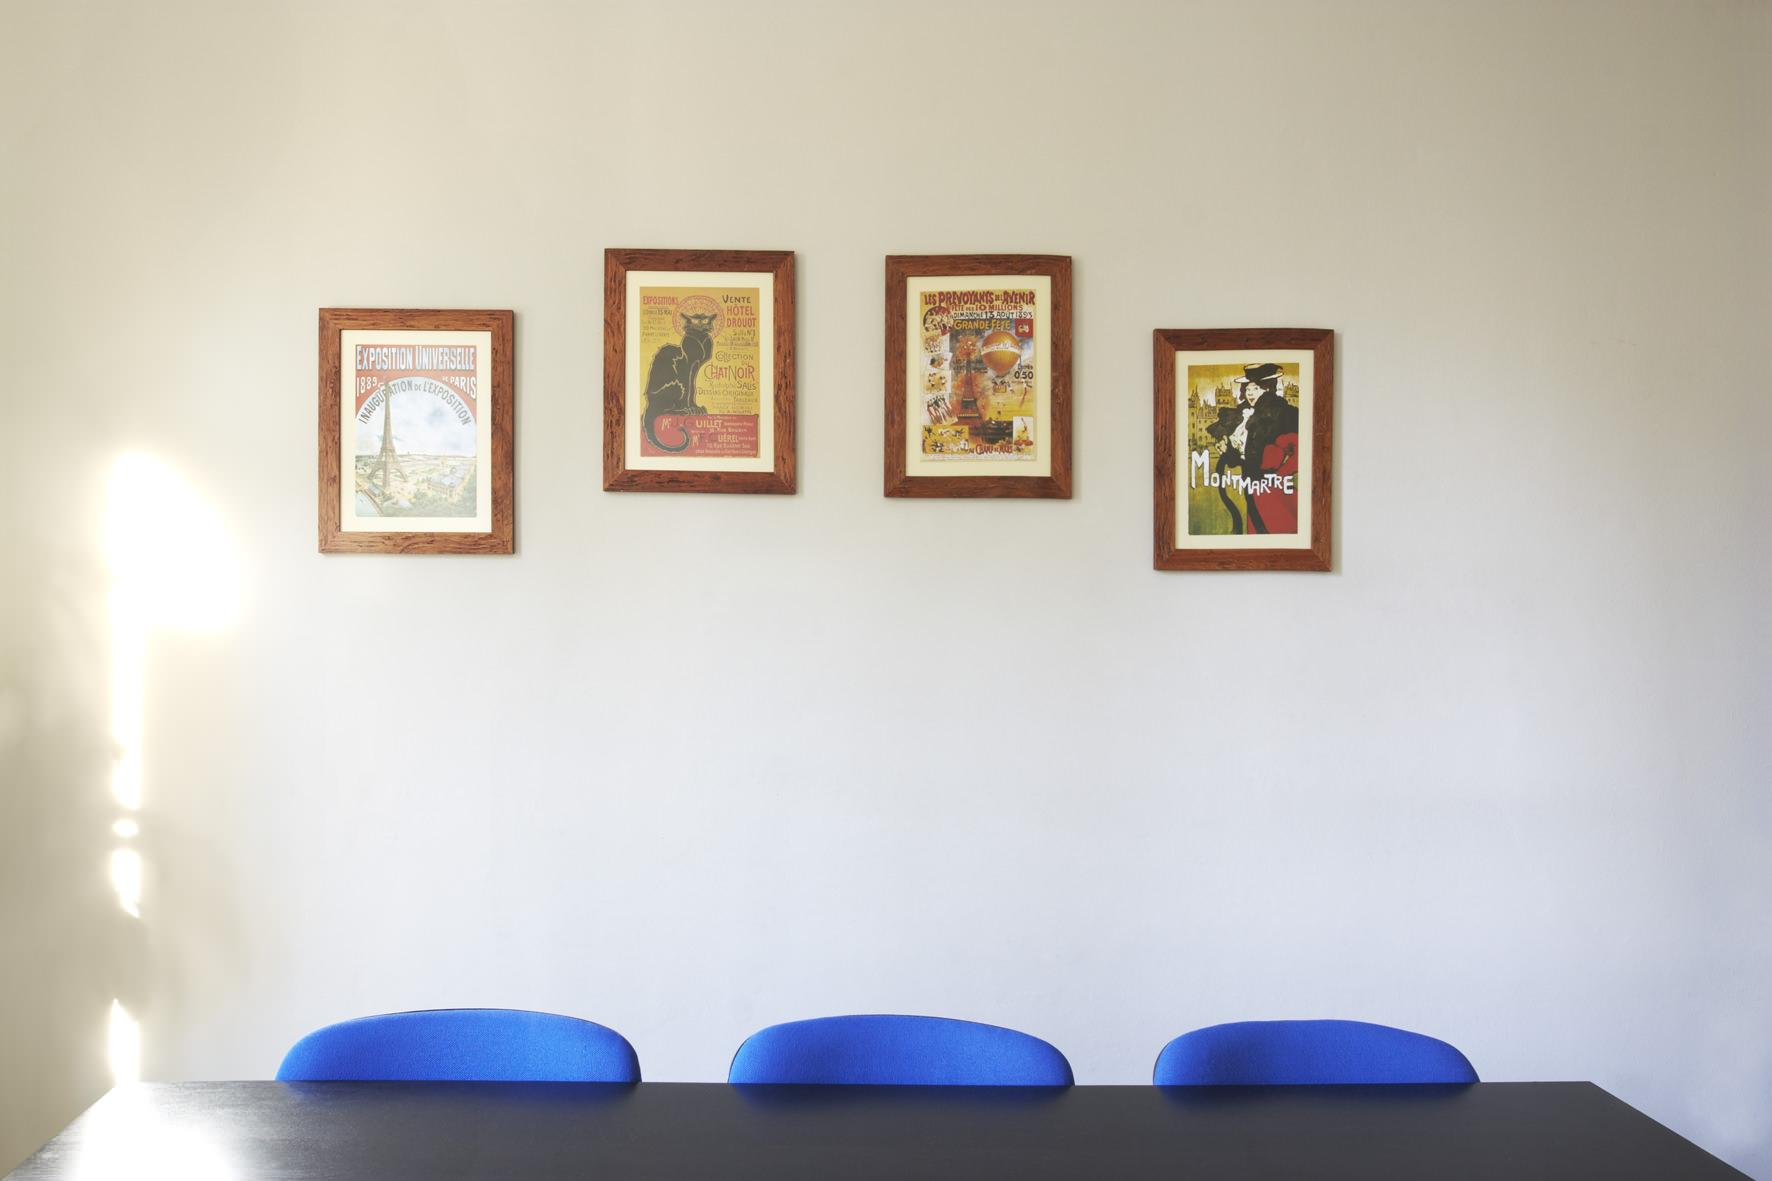 curs de conversa en francès CBLS Clase Barcelona Language School